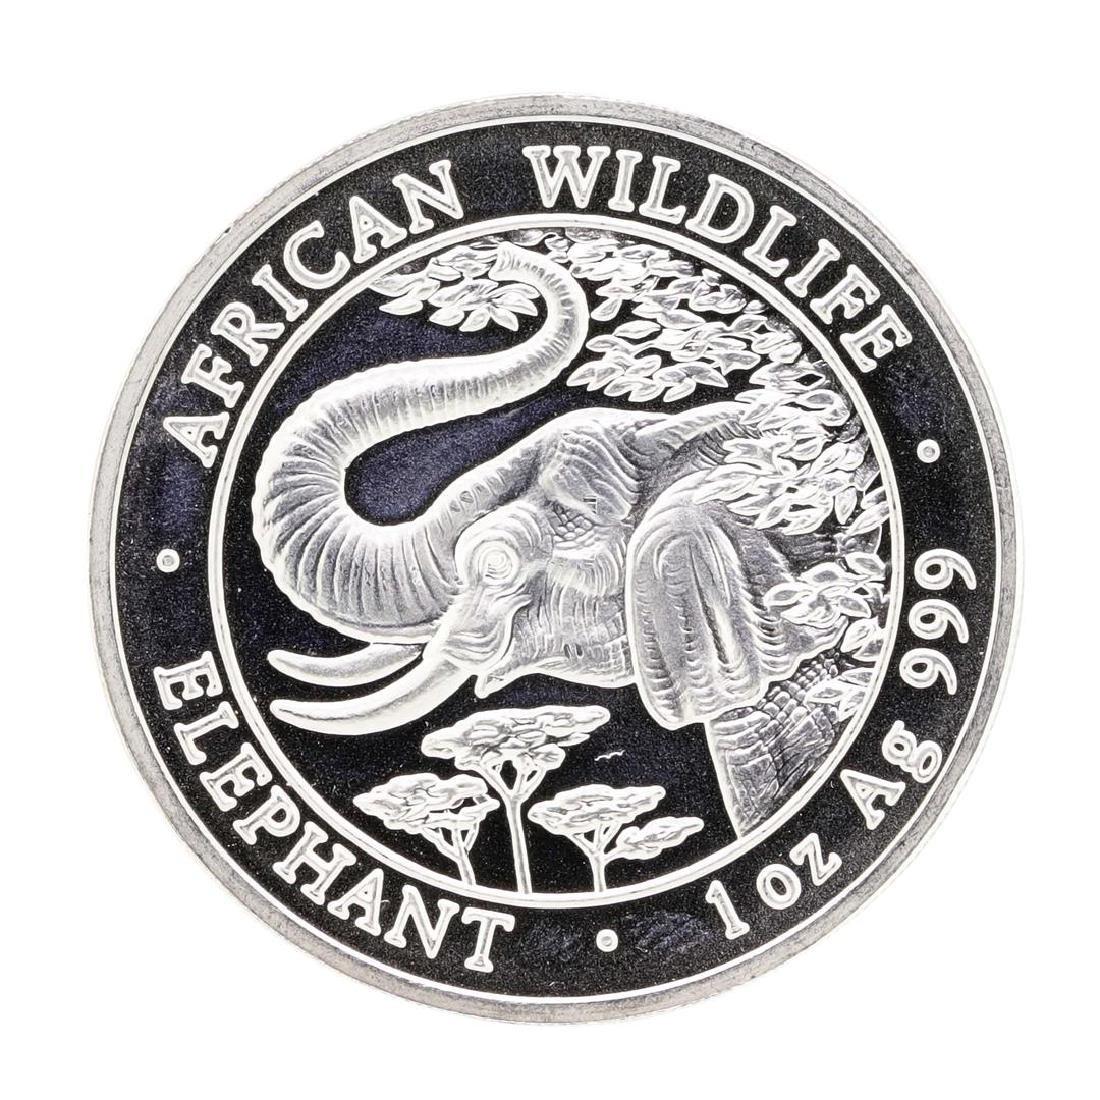 2005 1 oz. Silver Somalian African Elephant Coin